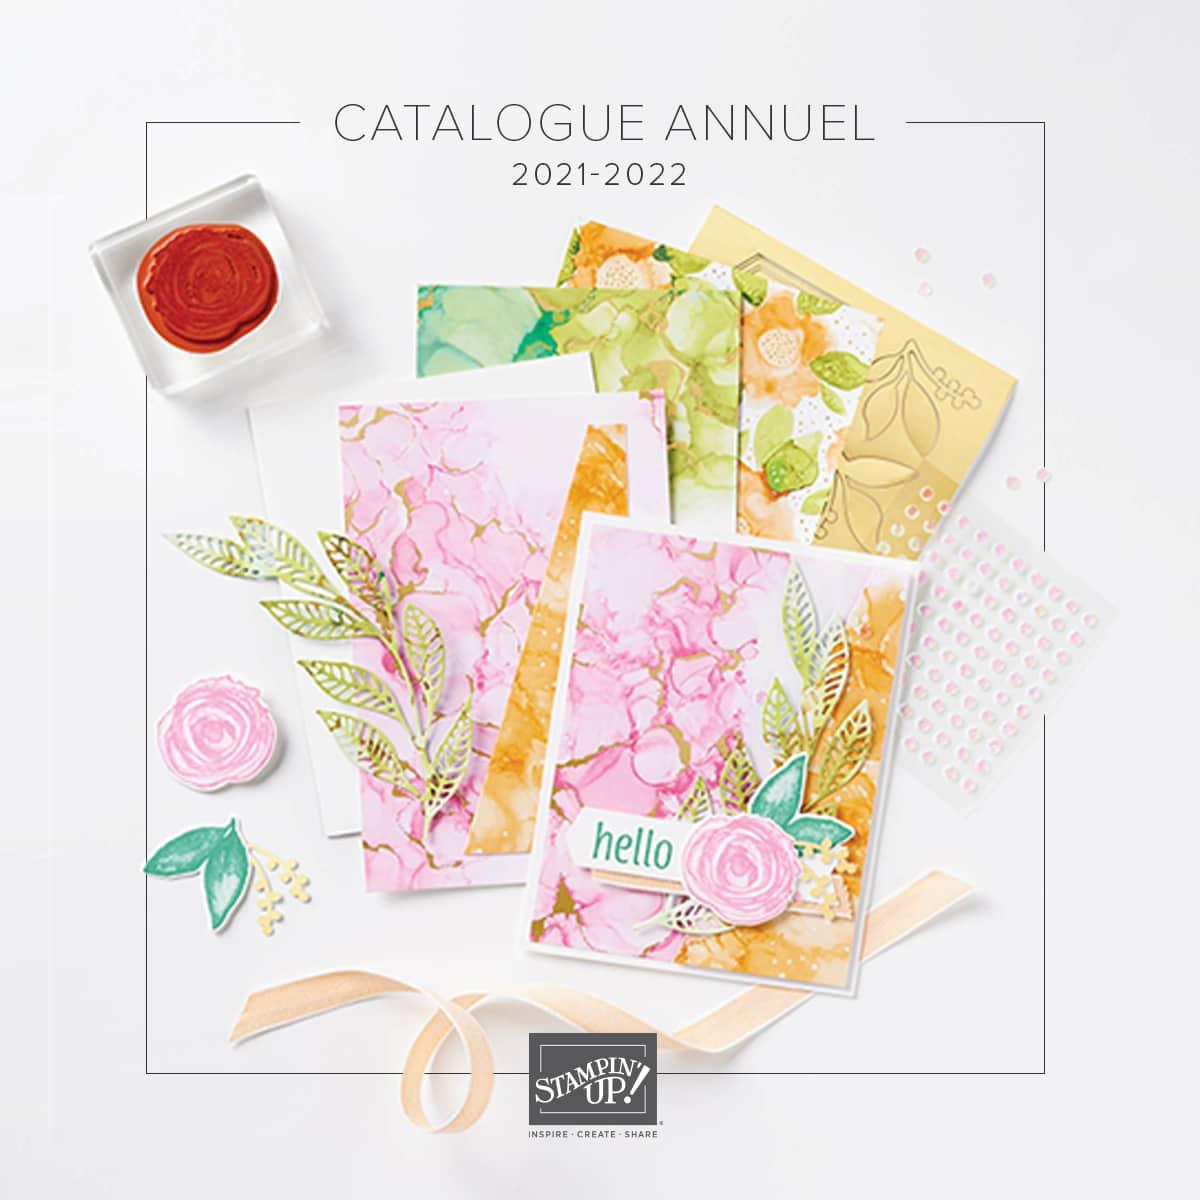 Catalogue Annuel 2021/2022